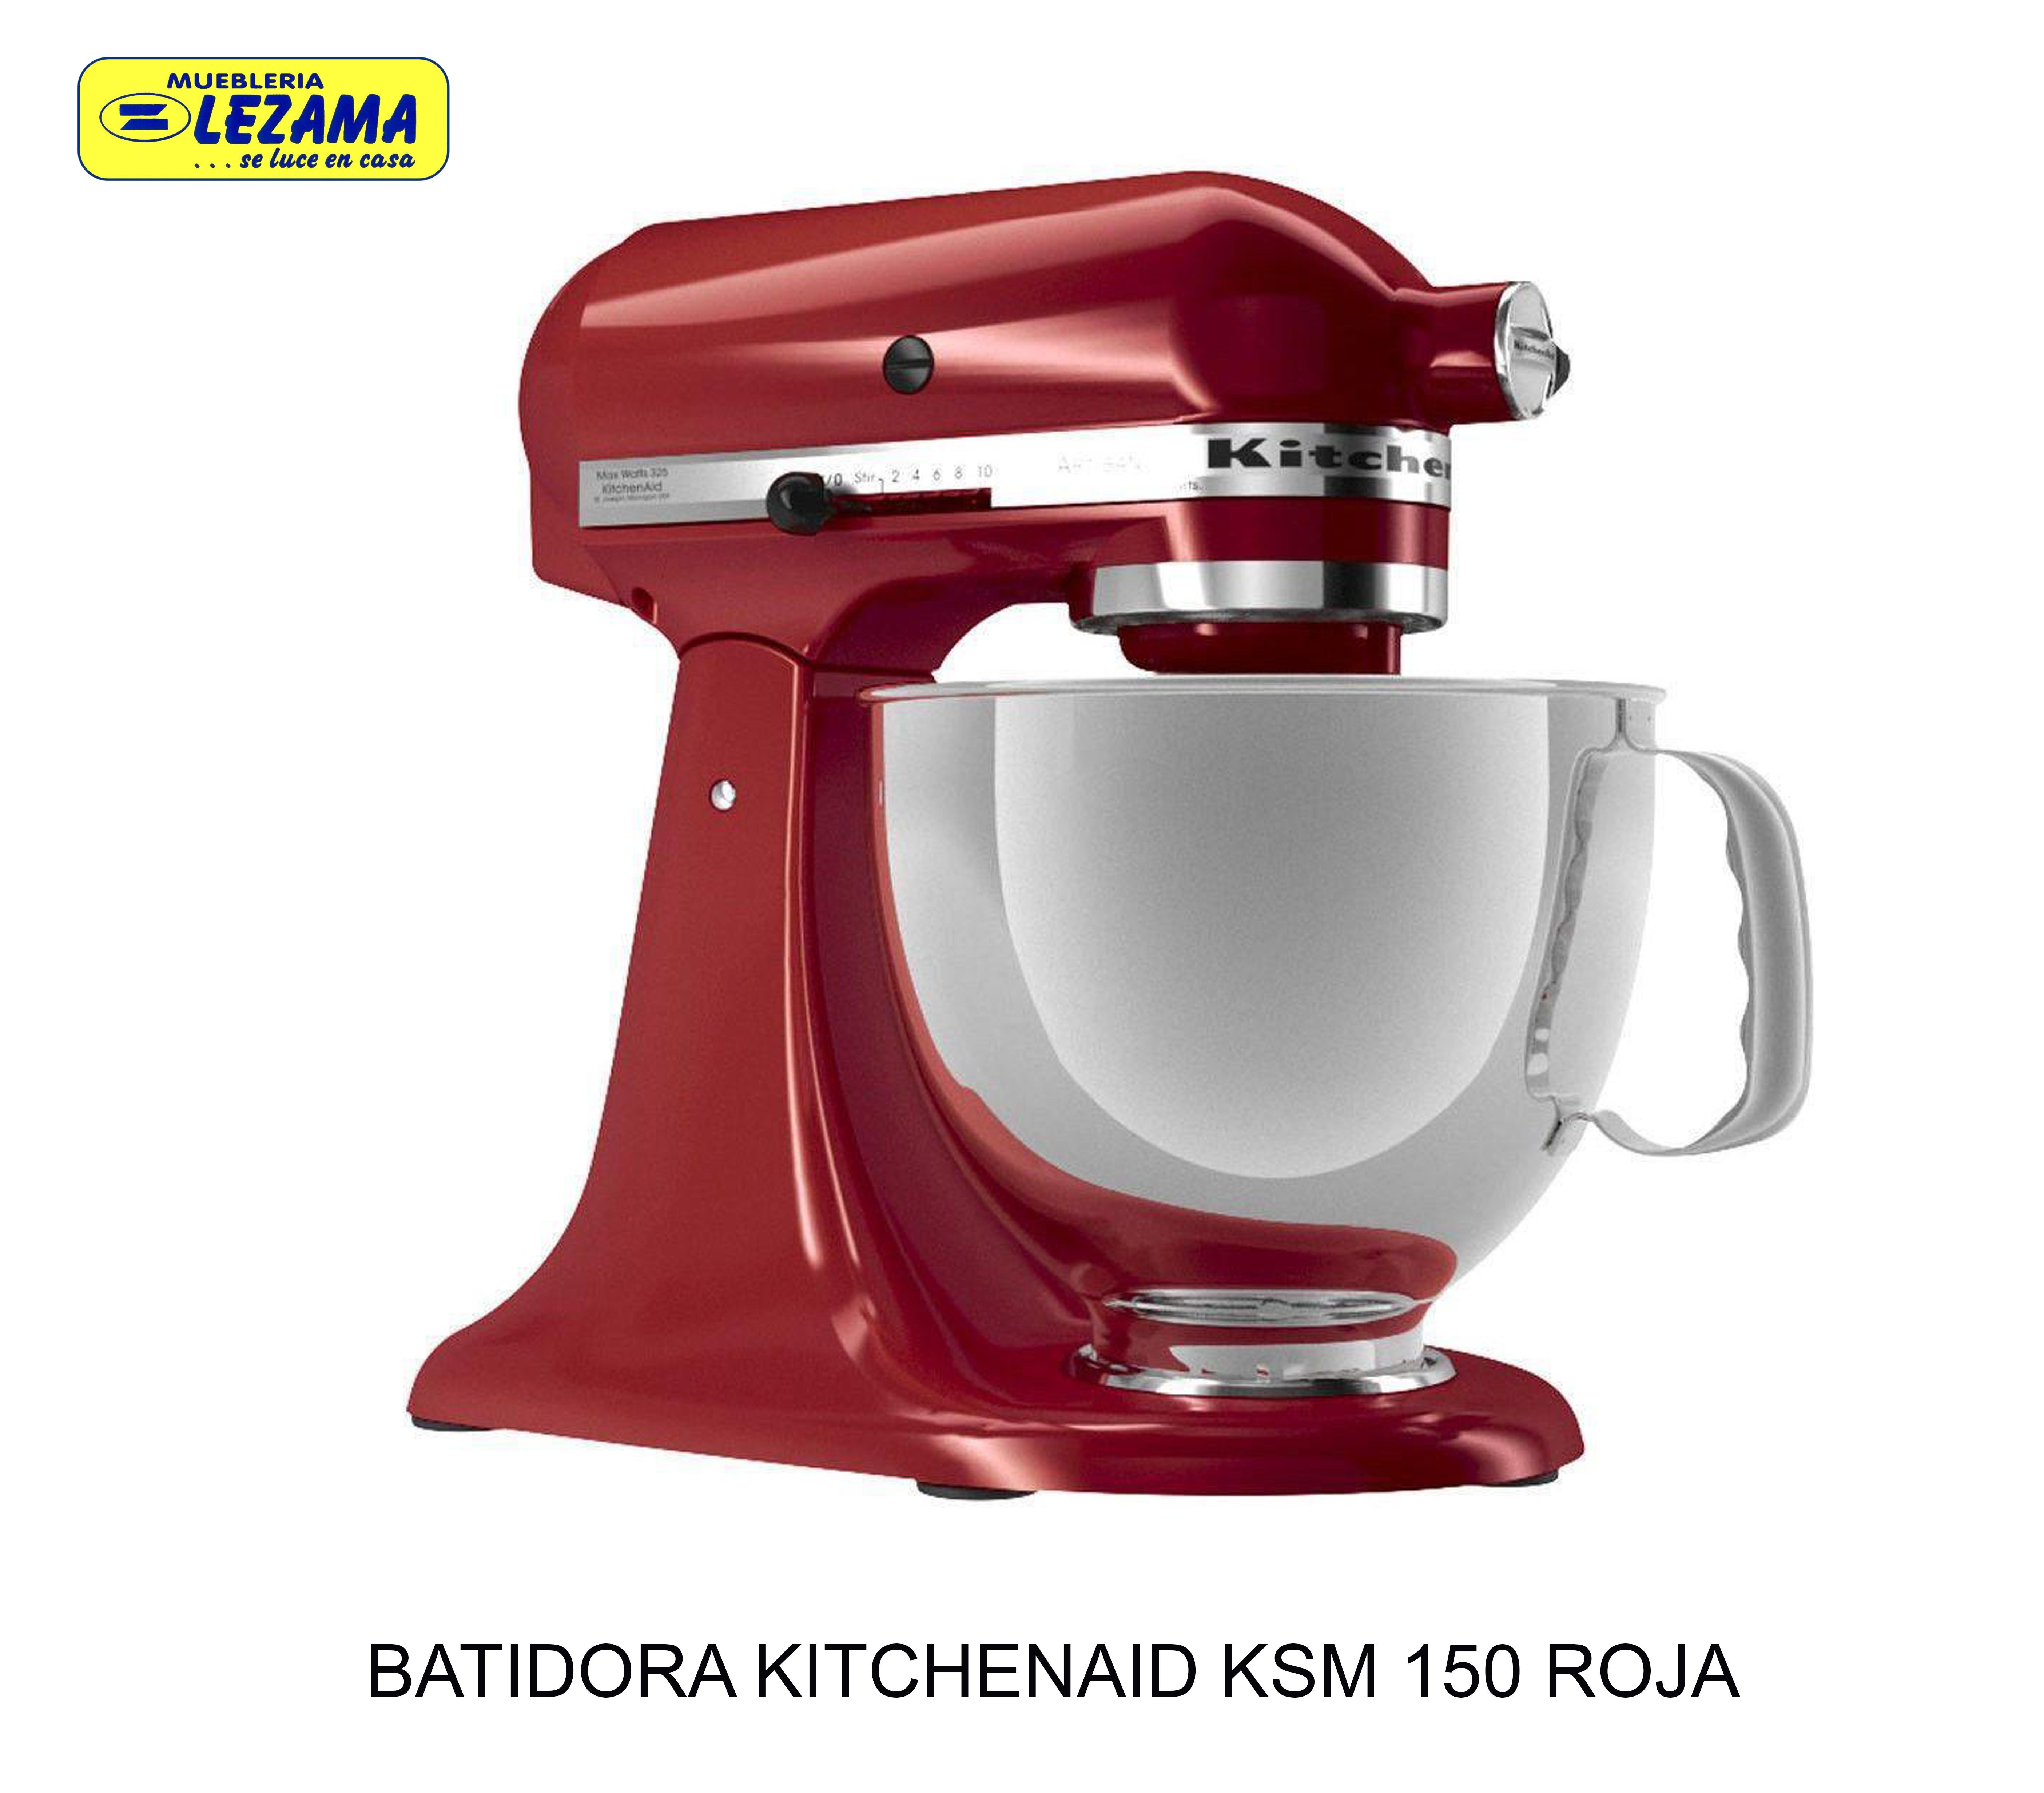 BATIDORA_KITCHENAID_KSM_150_ROJA.jpg